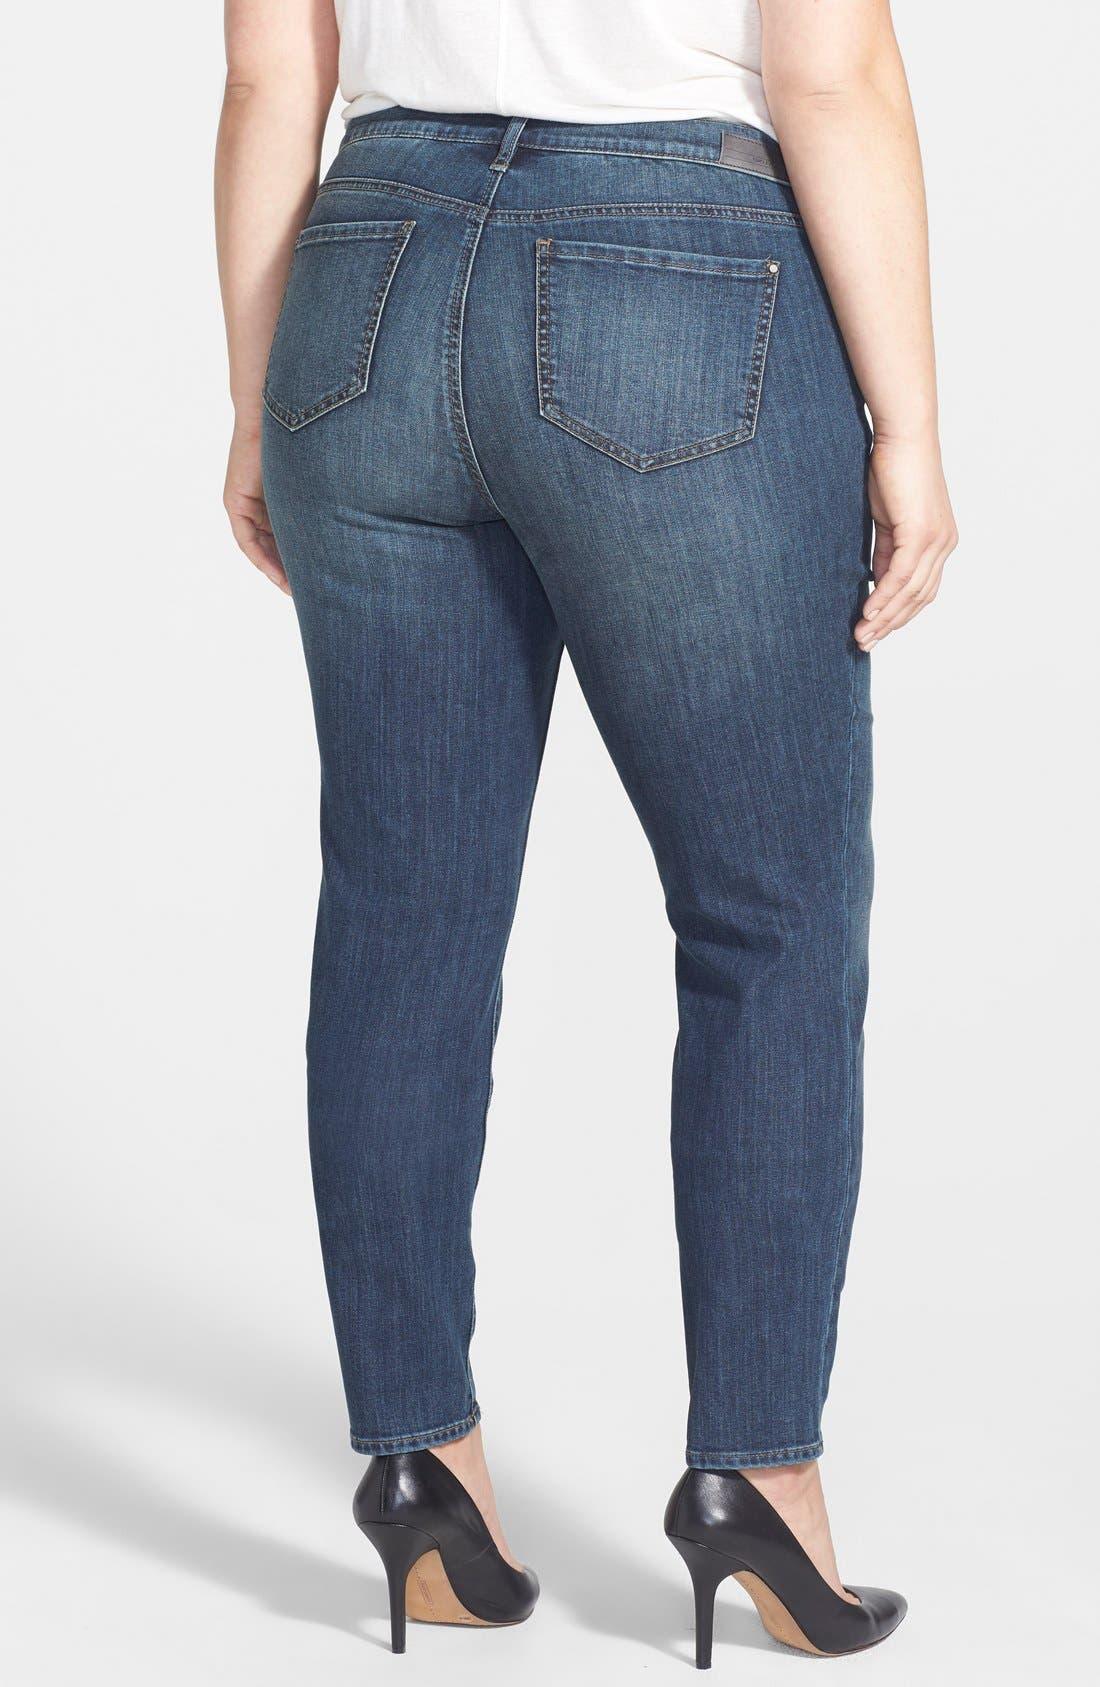 'Soho' Stretch Skinny Jeans,                             Alternate thumbnail 2, color,                             462